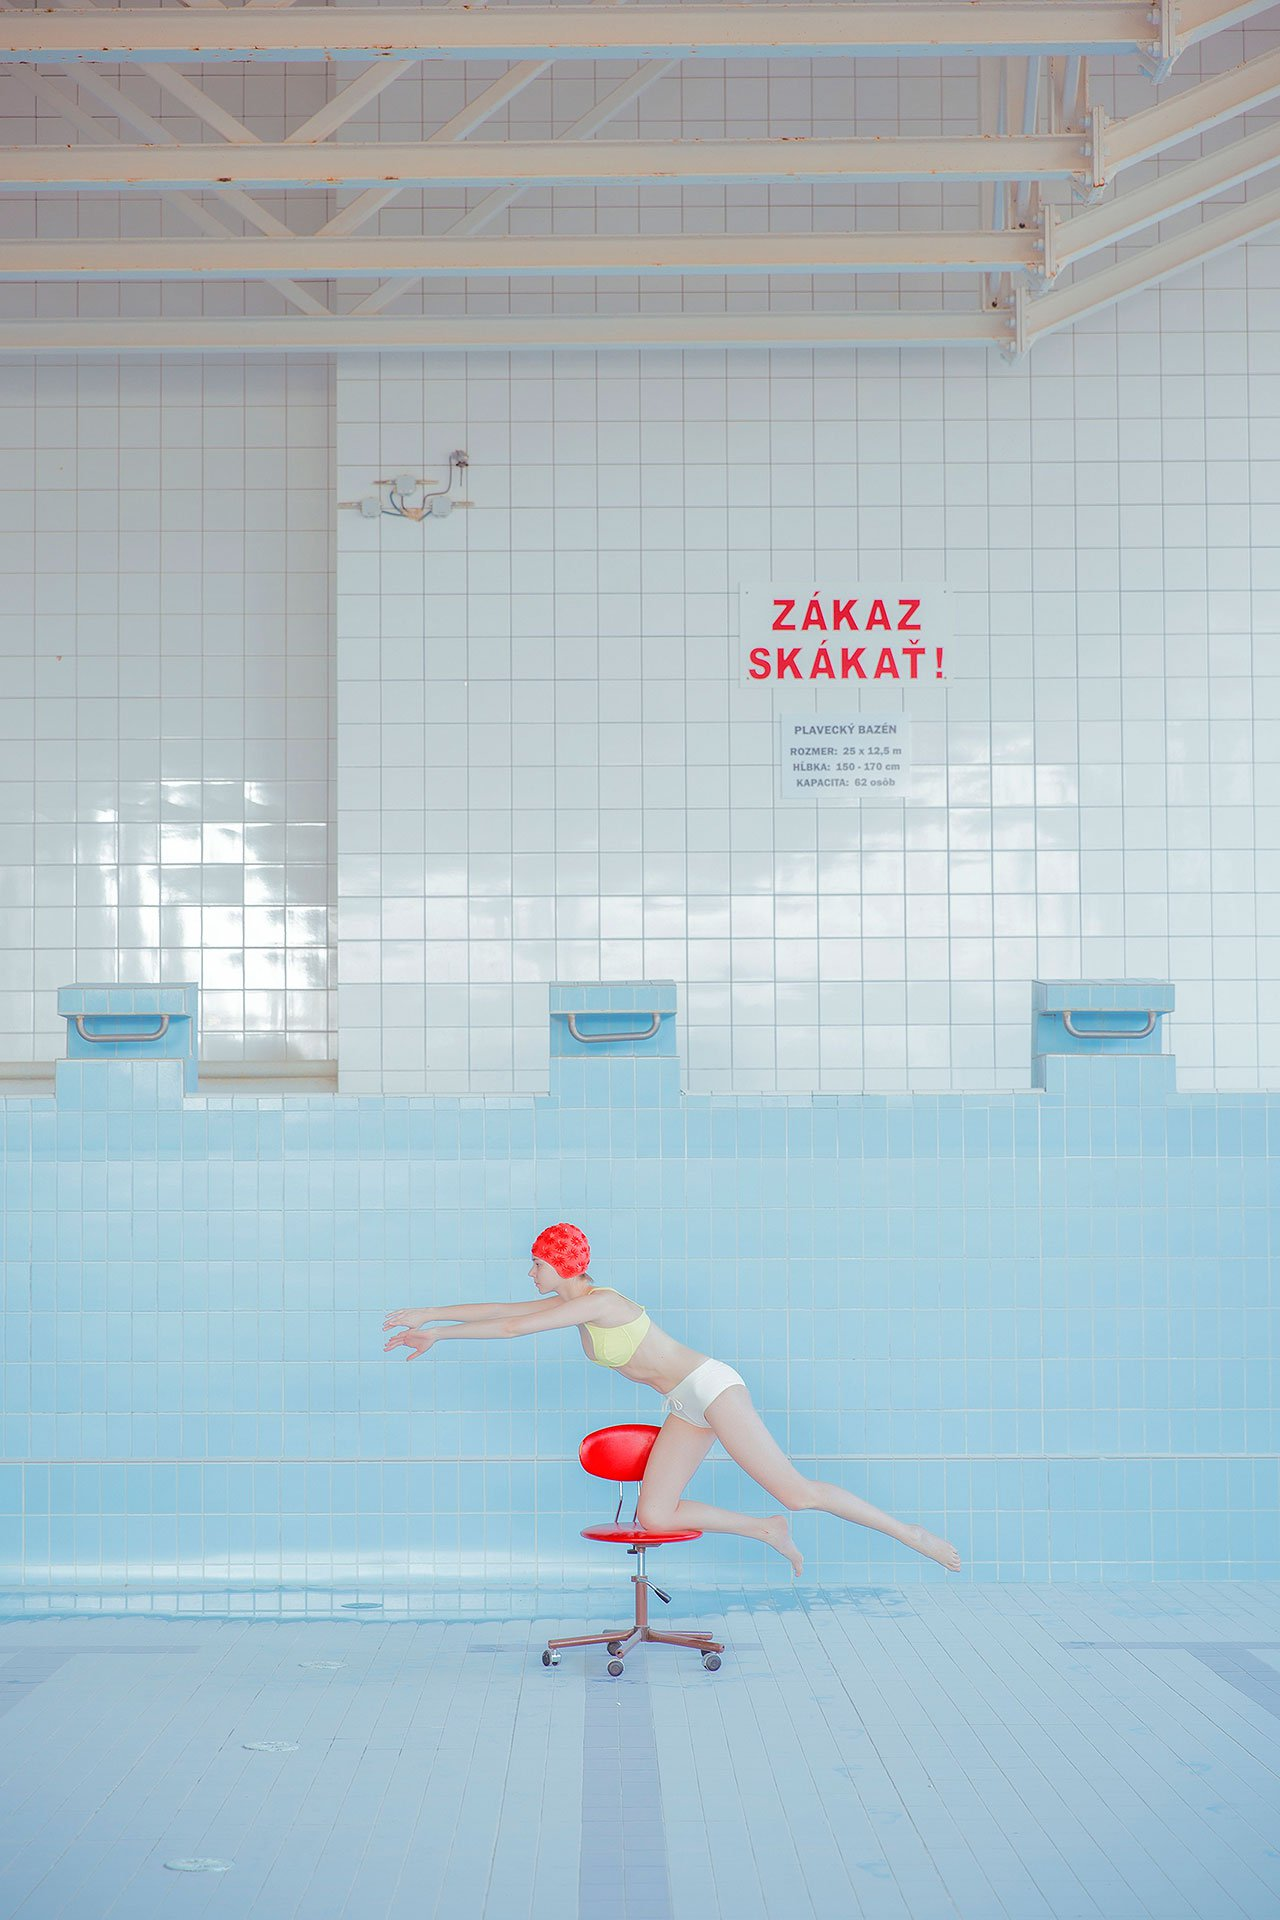 s1_maria_svarbova_pool_without_water_yatzer.jpg